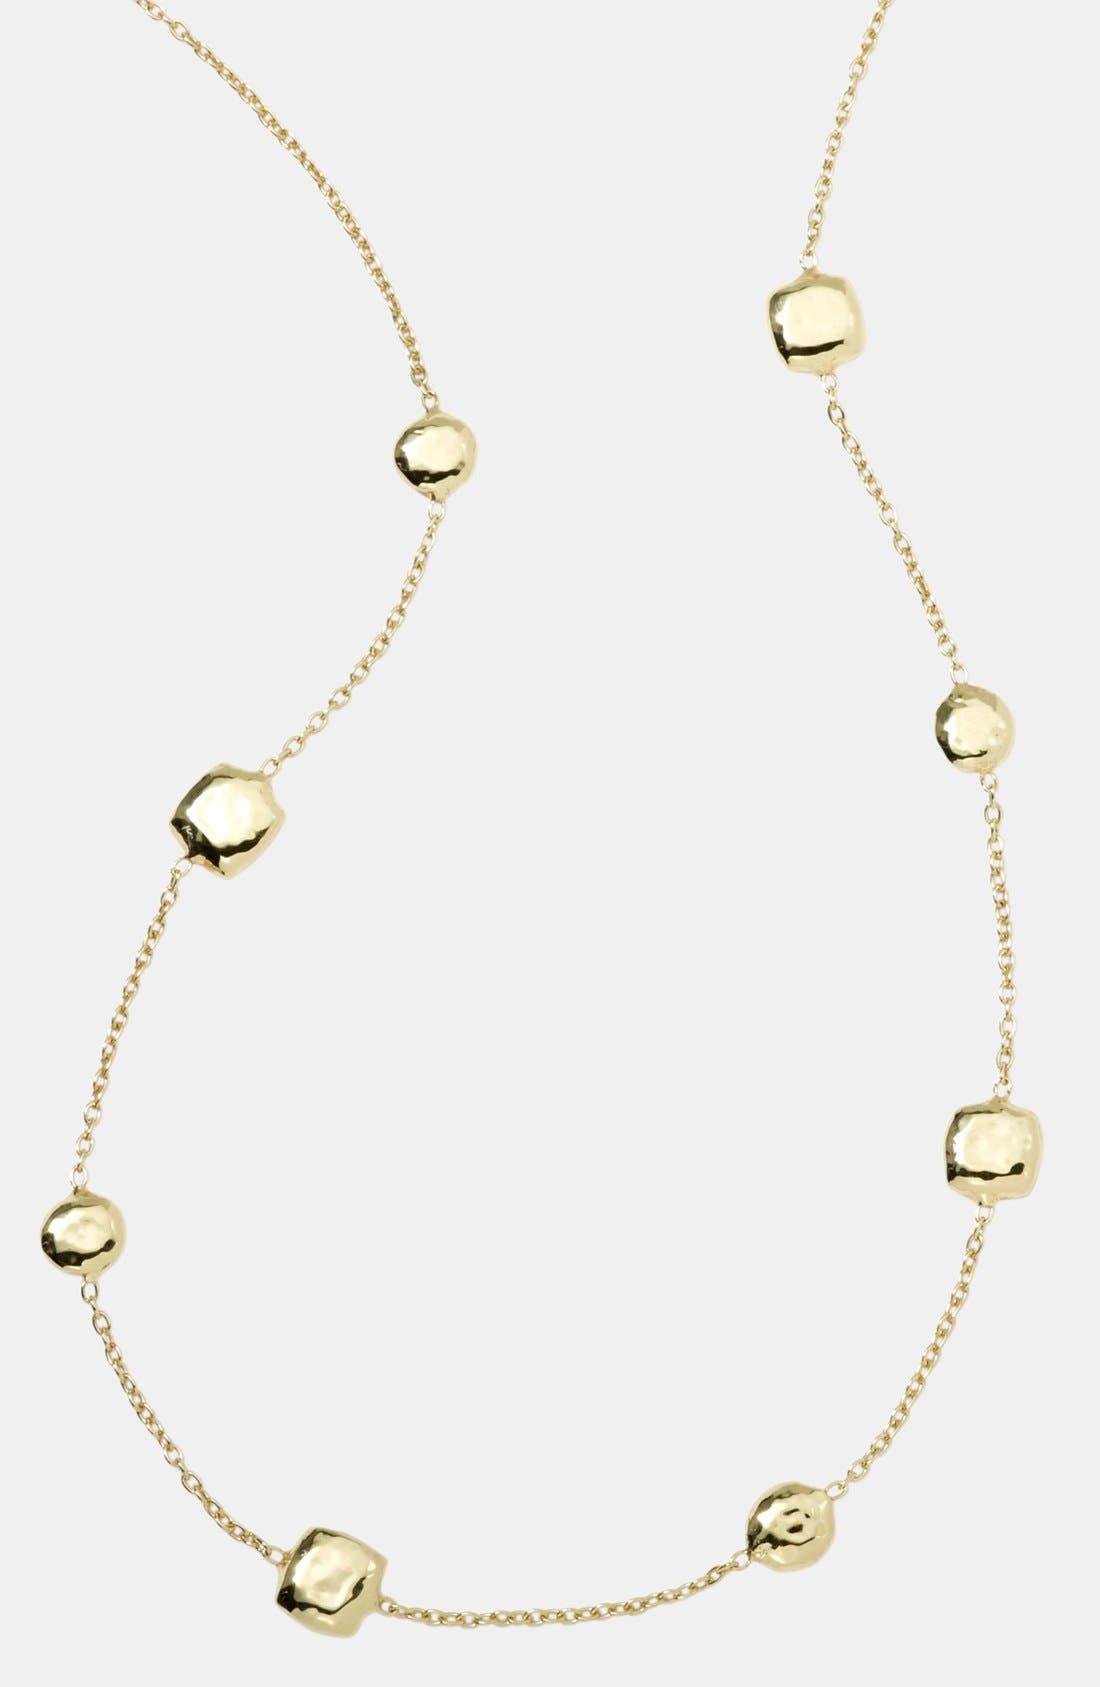 Main Image - Ippolita 'Glamazon' 18k Gold Station Necklace